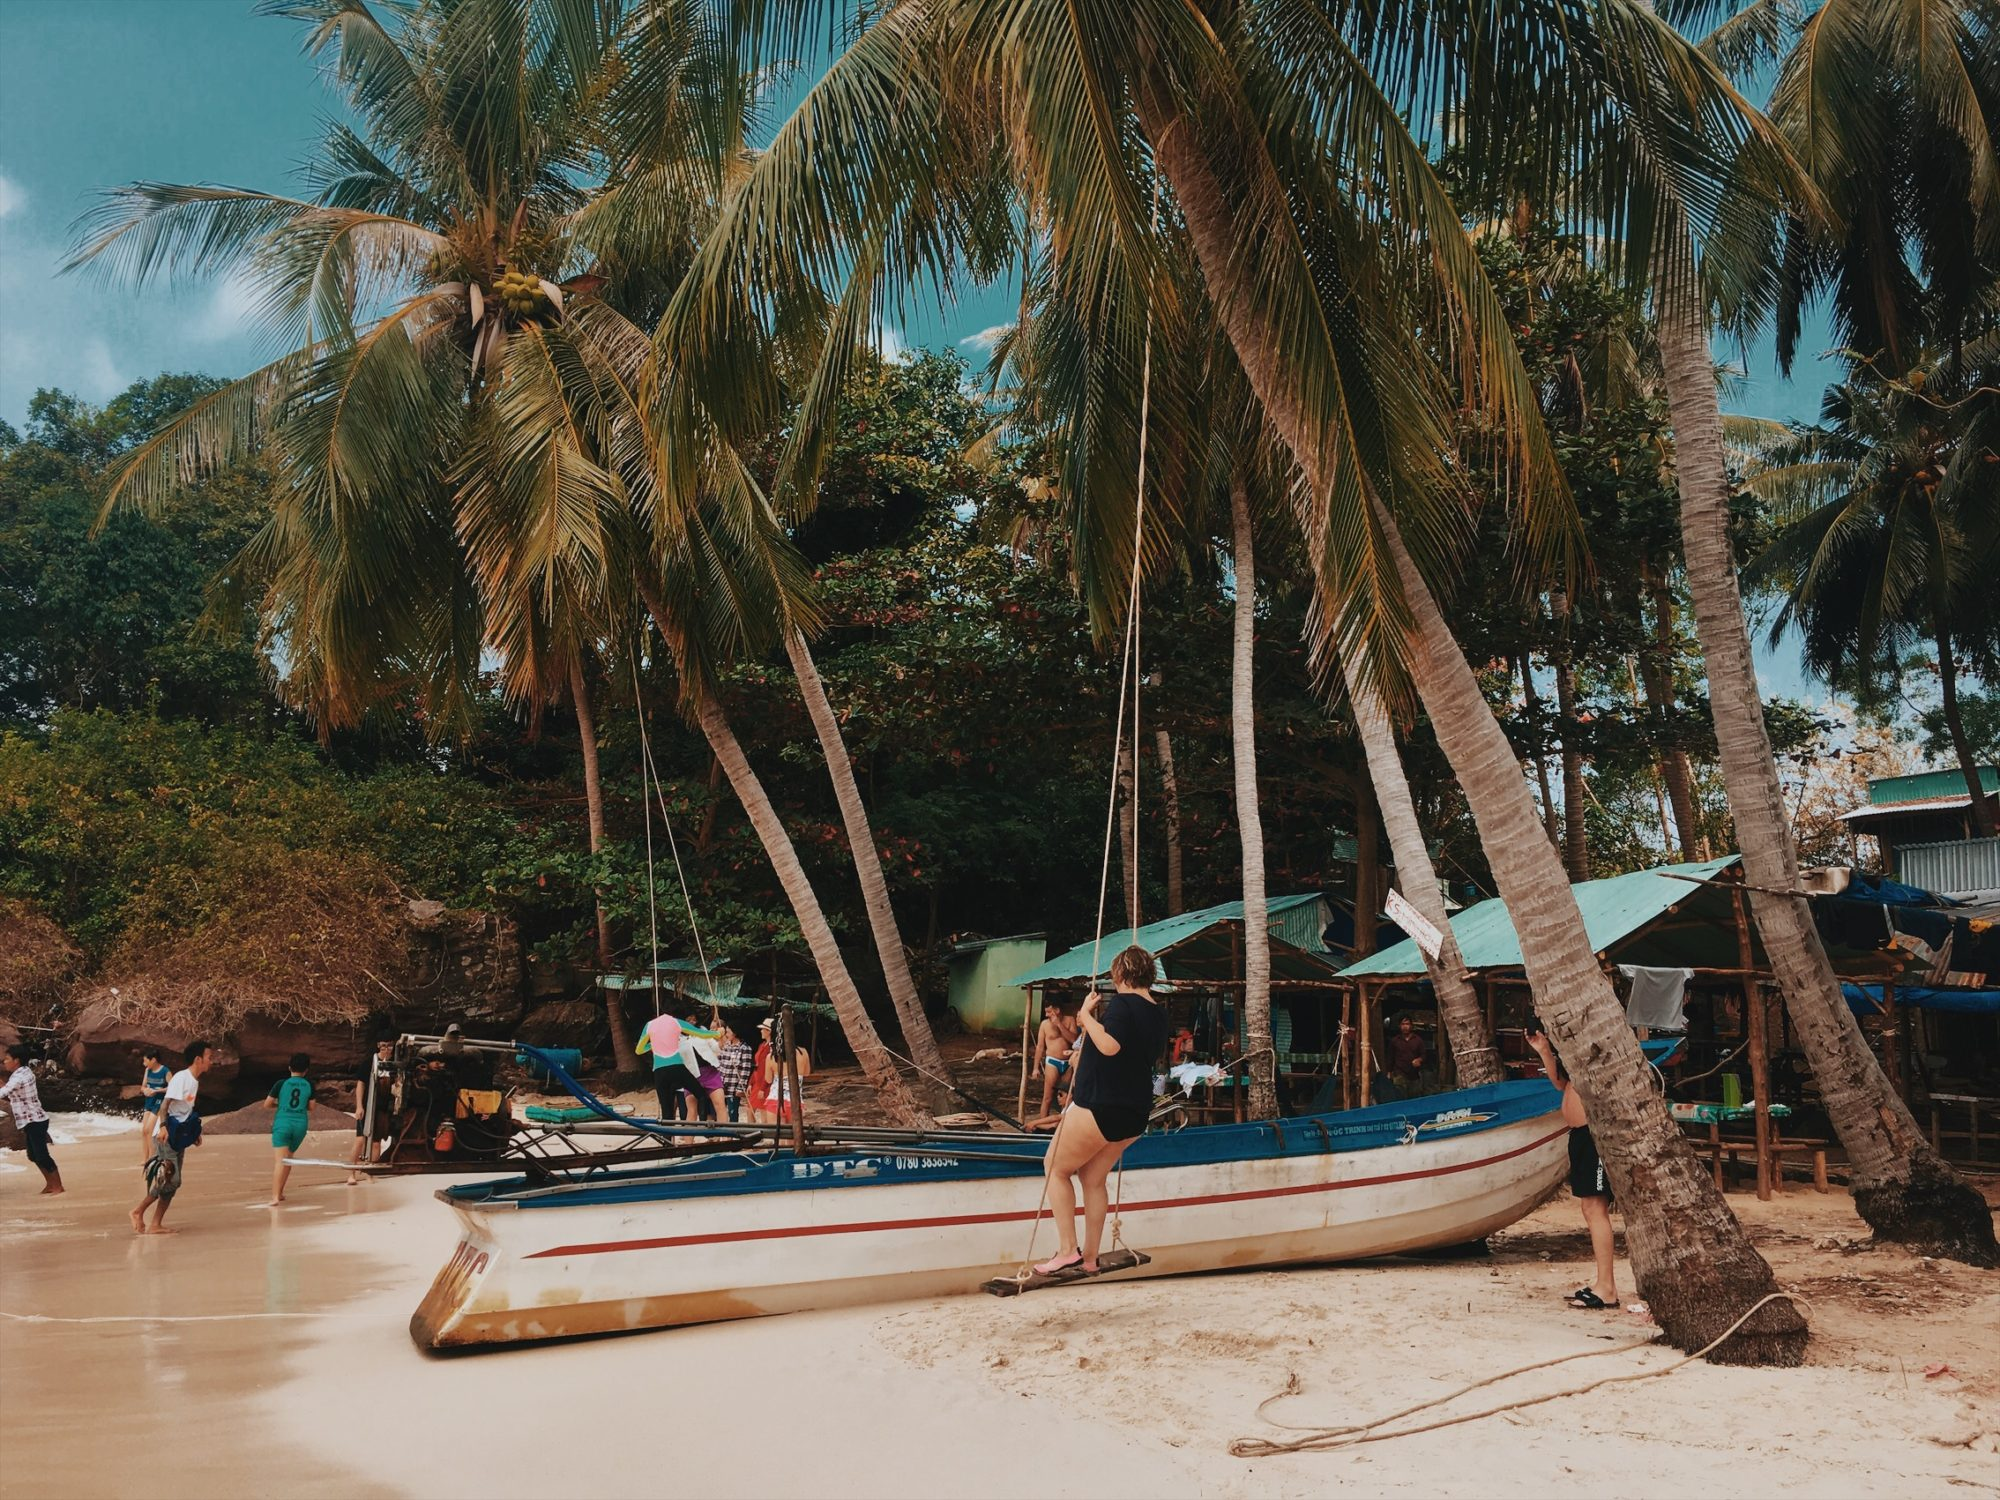 rajska plaża na fingernail island an thoi plaze w wietnamie neverendingtravel.pl